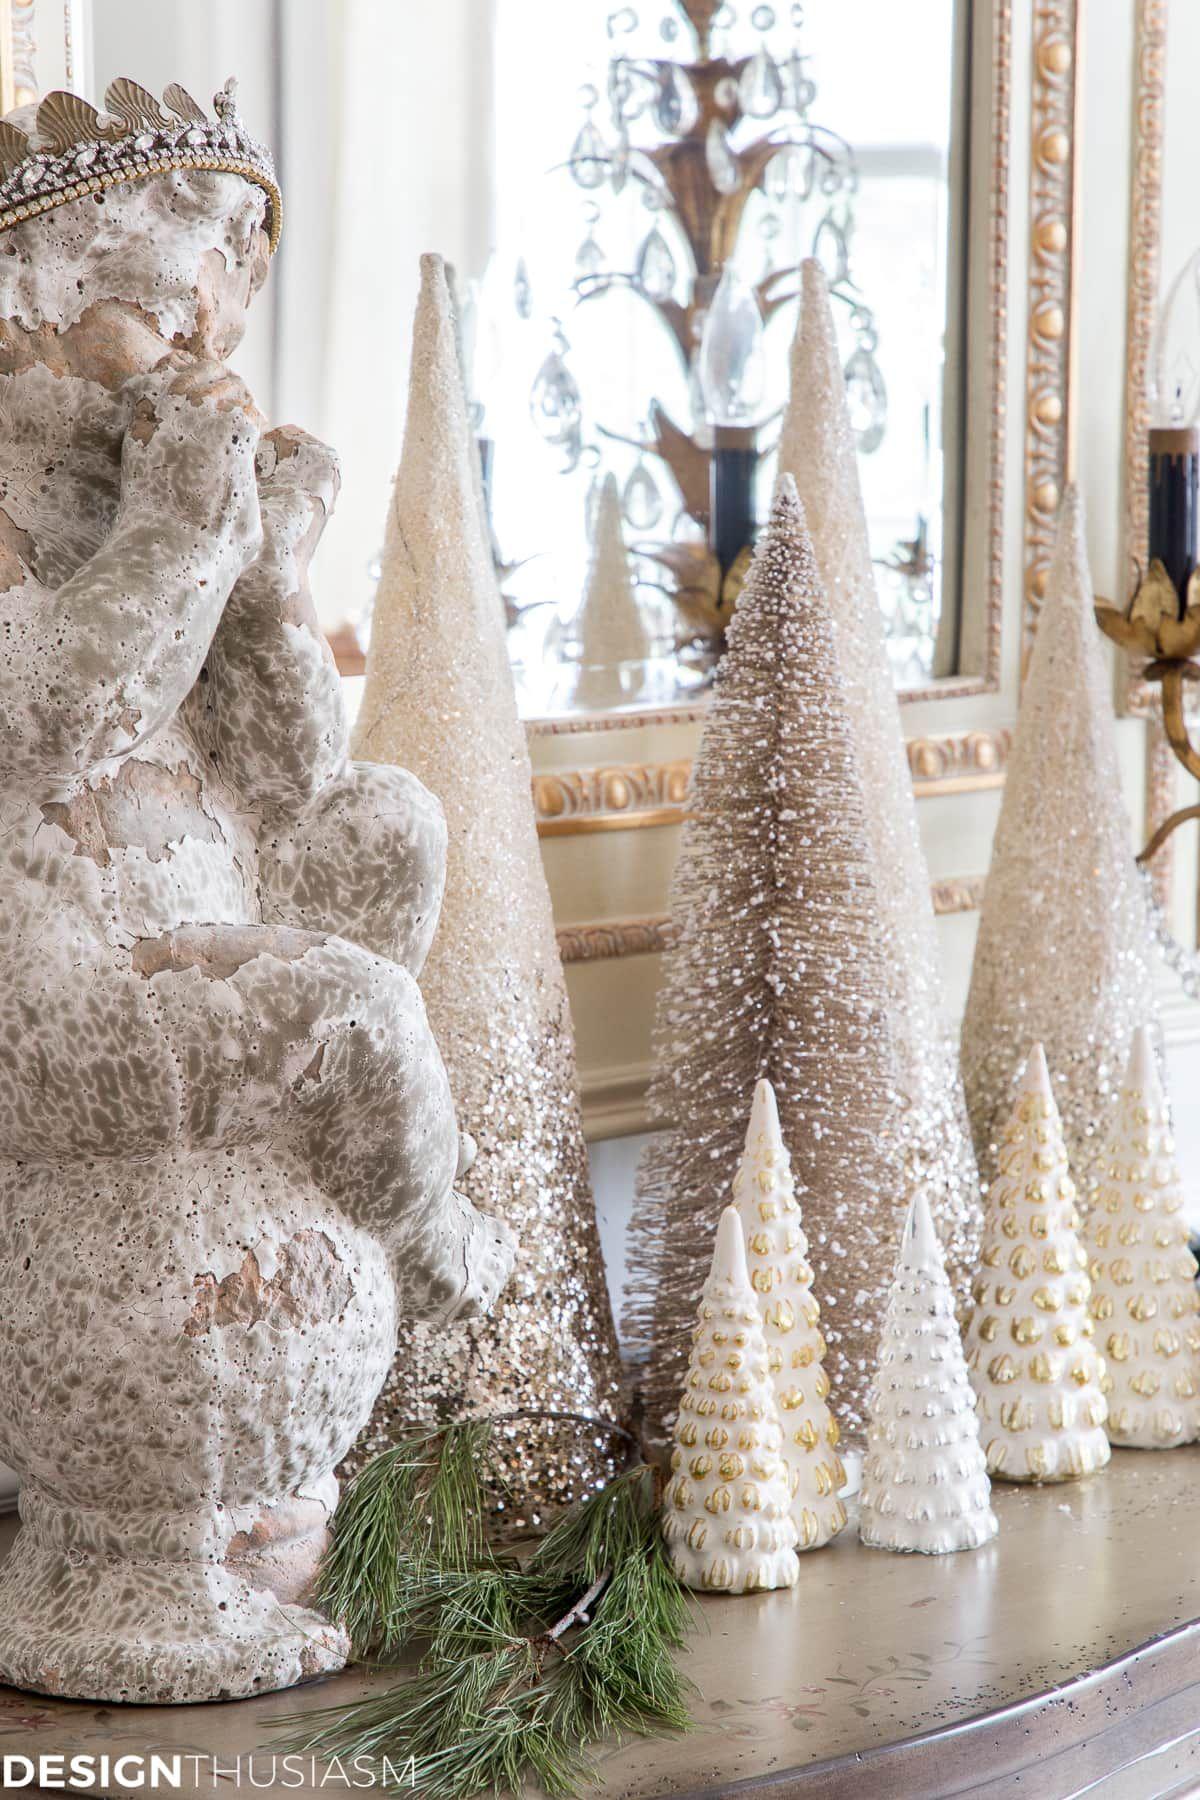 Elegant Holiday Decorating Ideas For The Dining Room Elegant